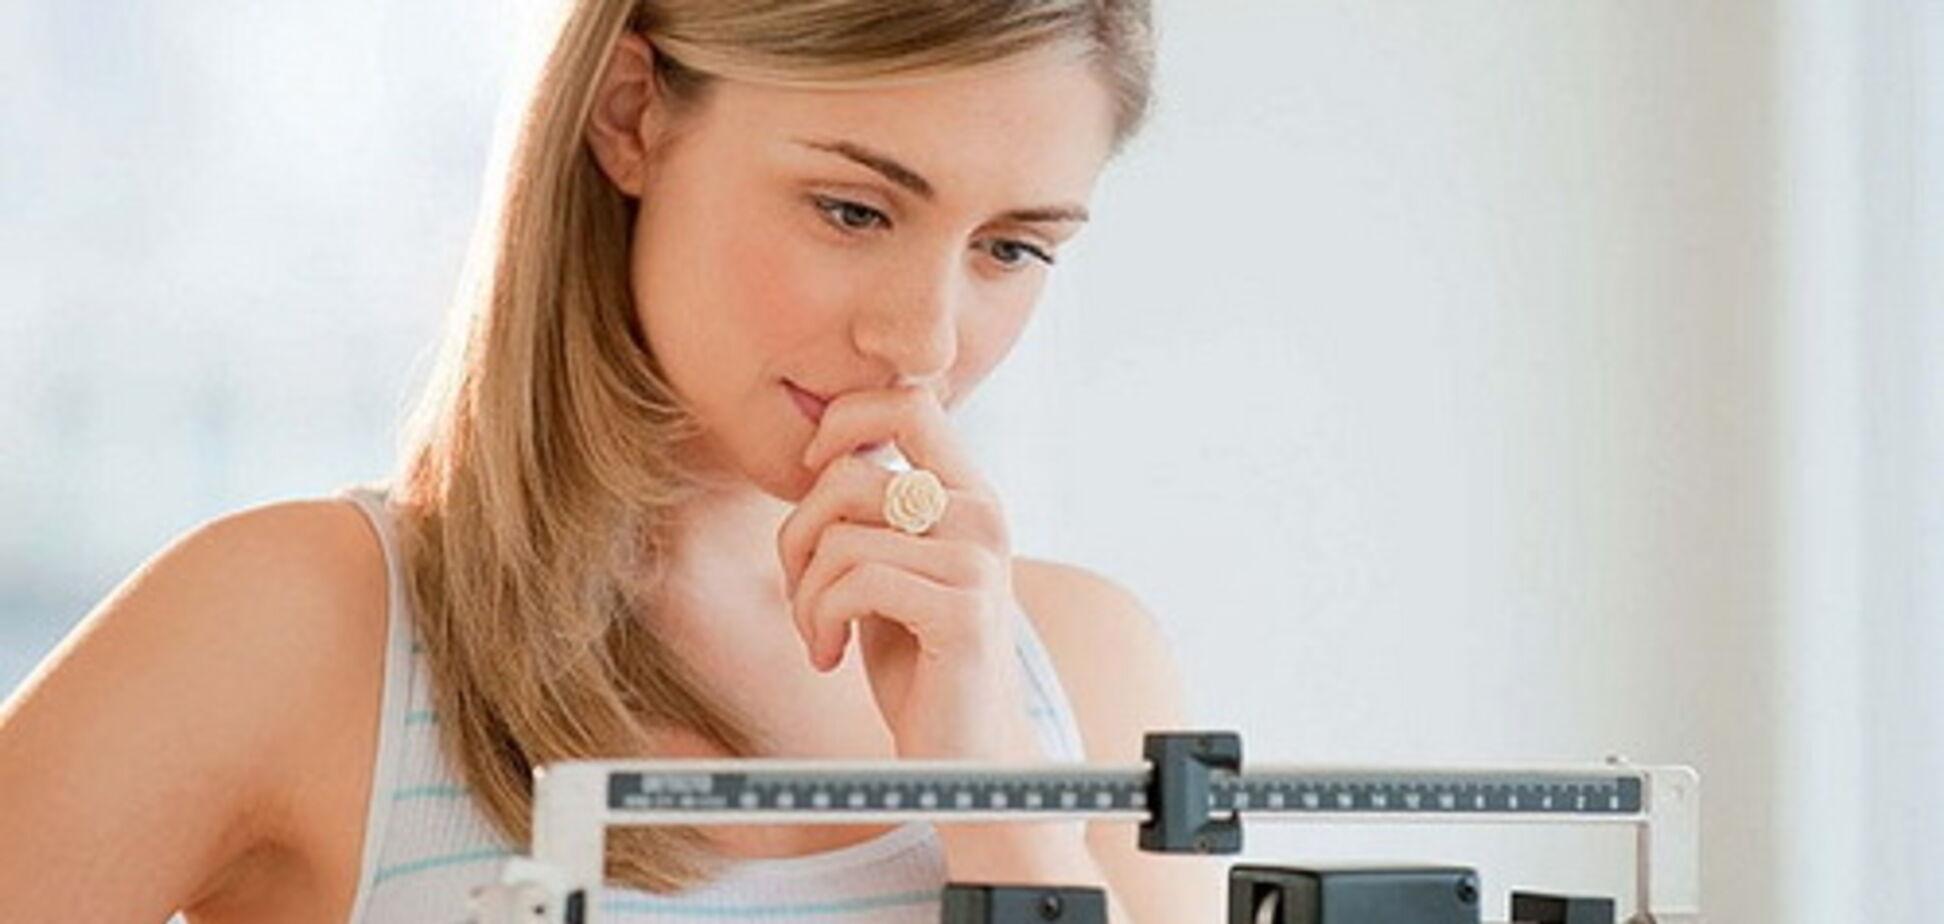 Як не набрати вагу на Великдень: топ-3 поради